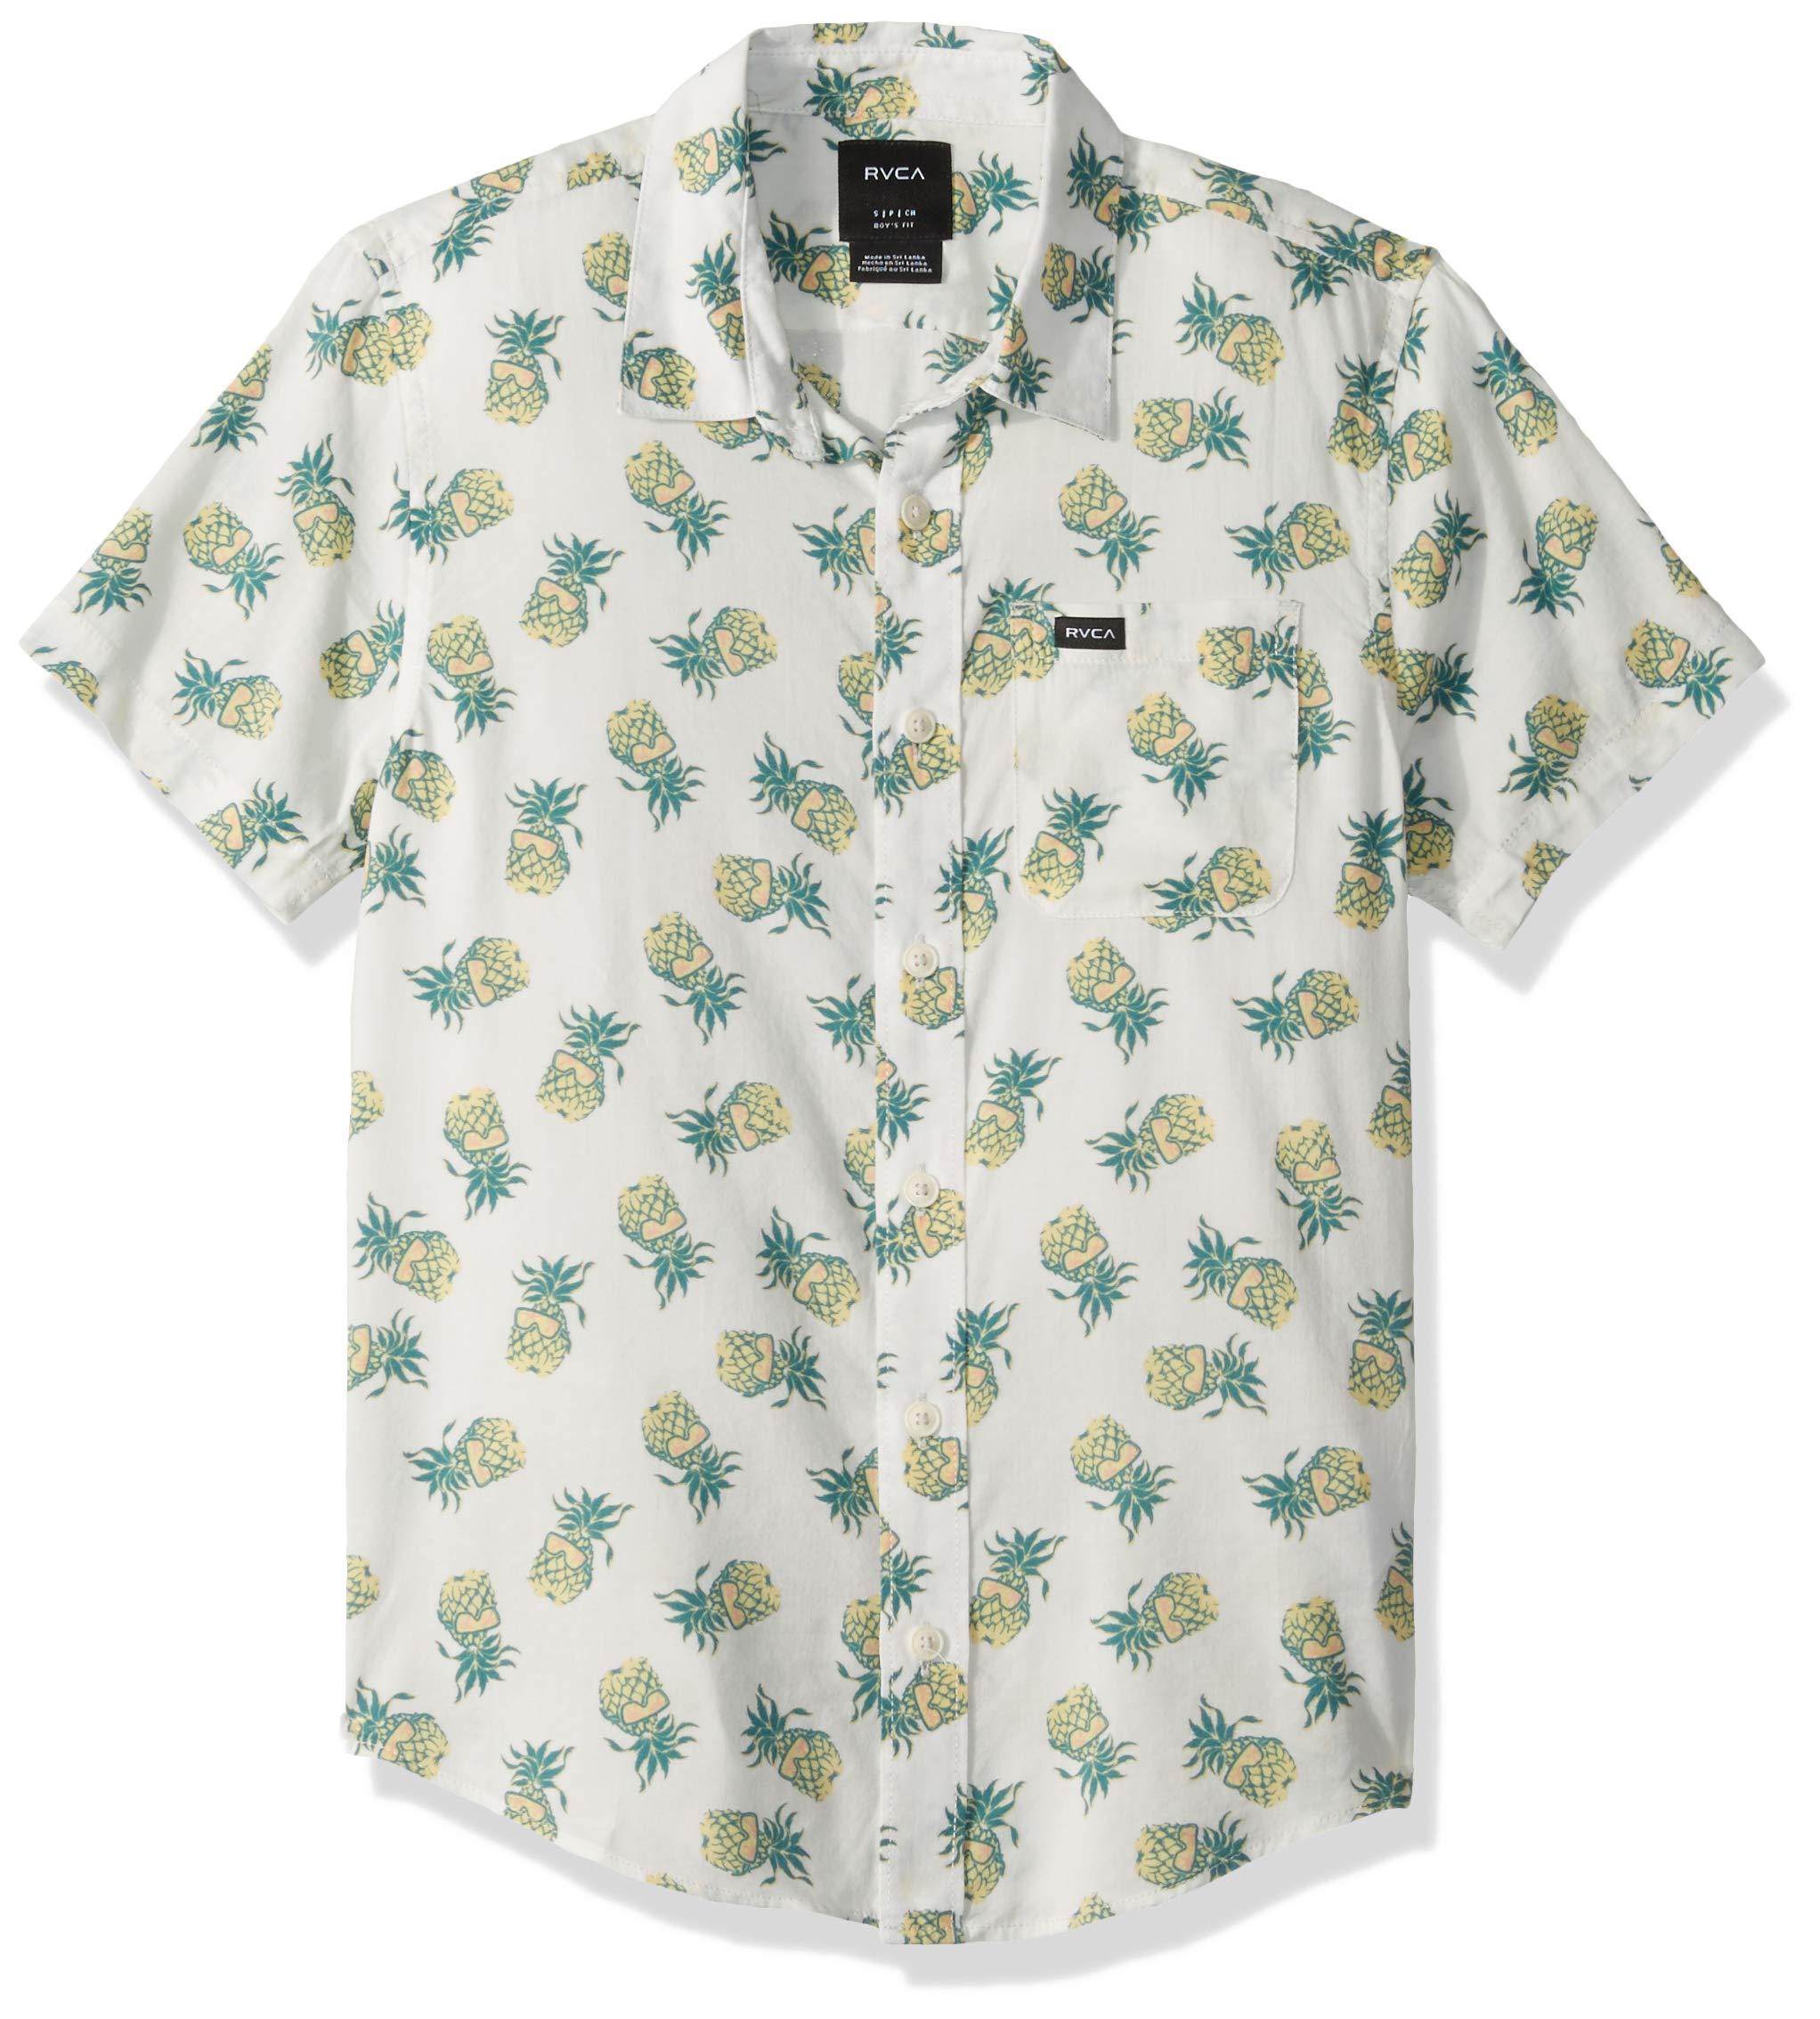 RVCA Boys' Big ANP Pack Short Sleeve Woven Button UP Shirt, Antique/White, S